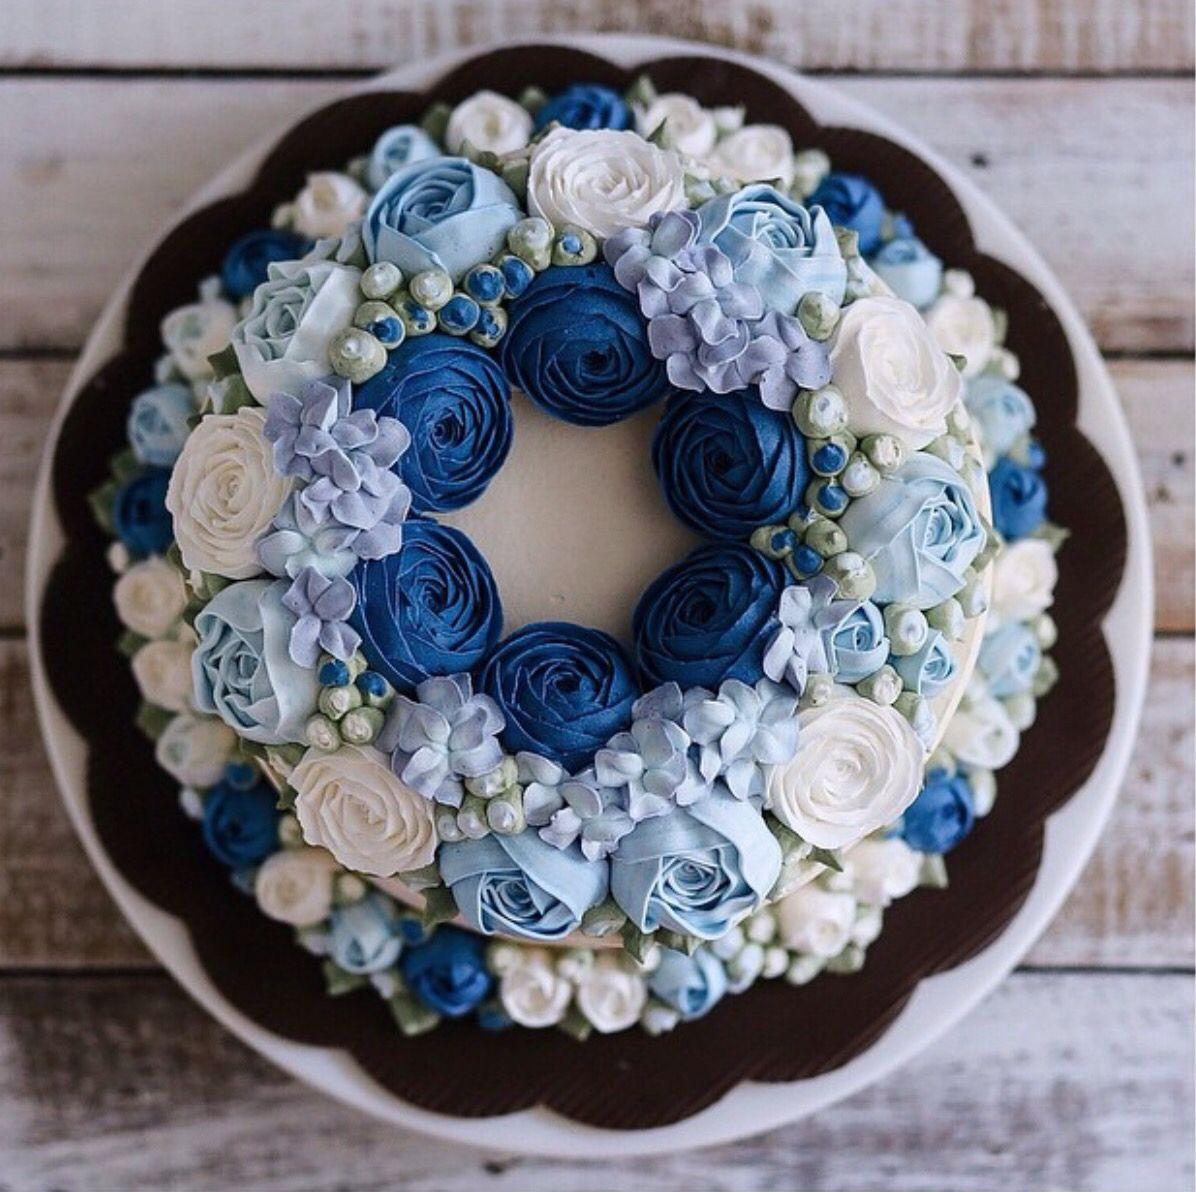 Ivenoven designer! Chocolate bundt cake with expertly